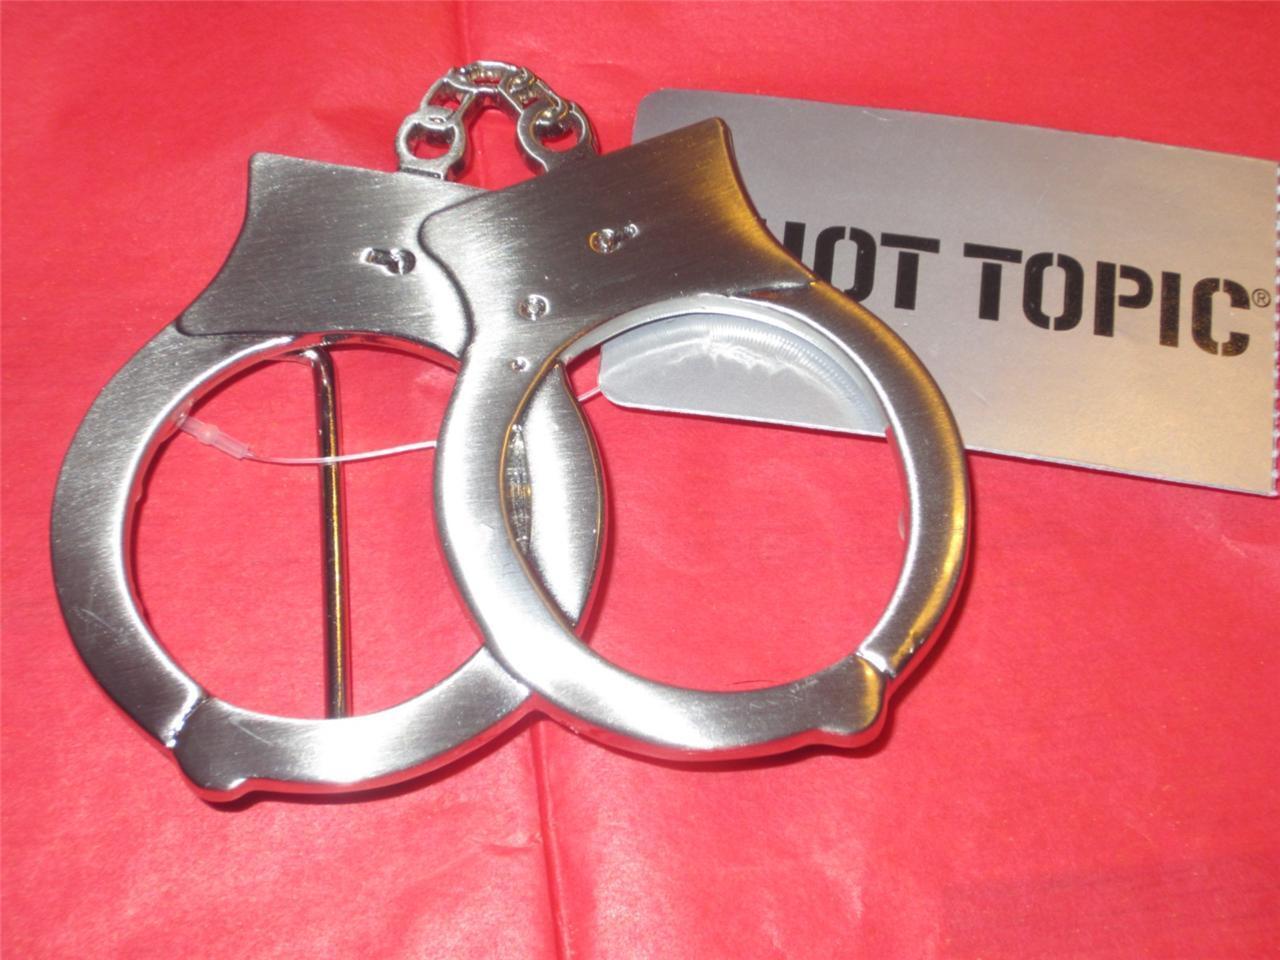 Hot Topic Hand Cuffs Metal Belt Buckle